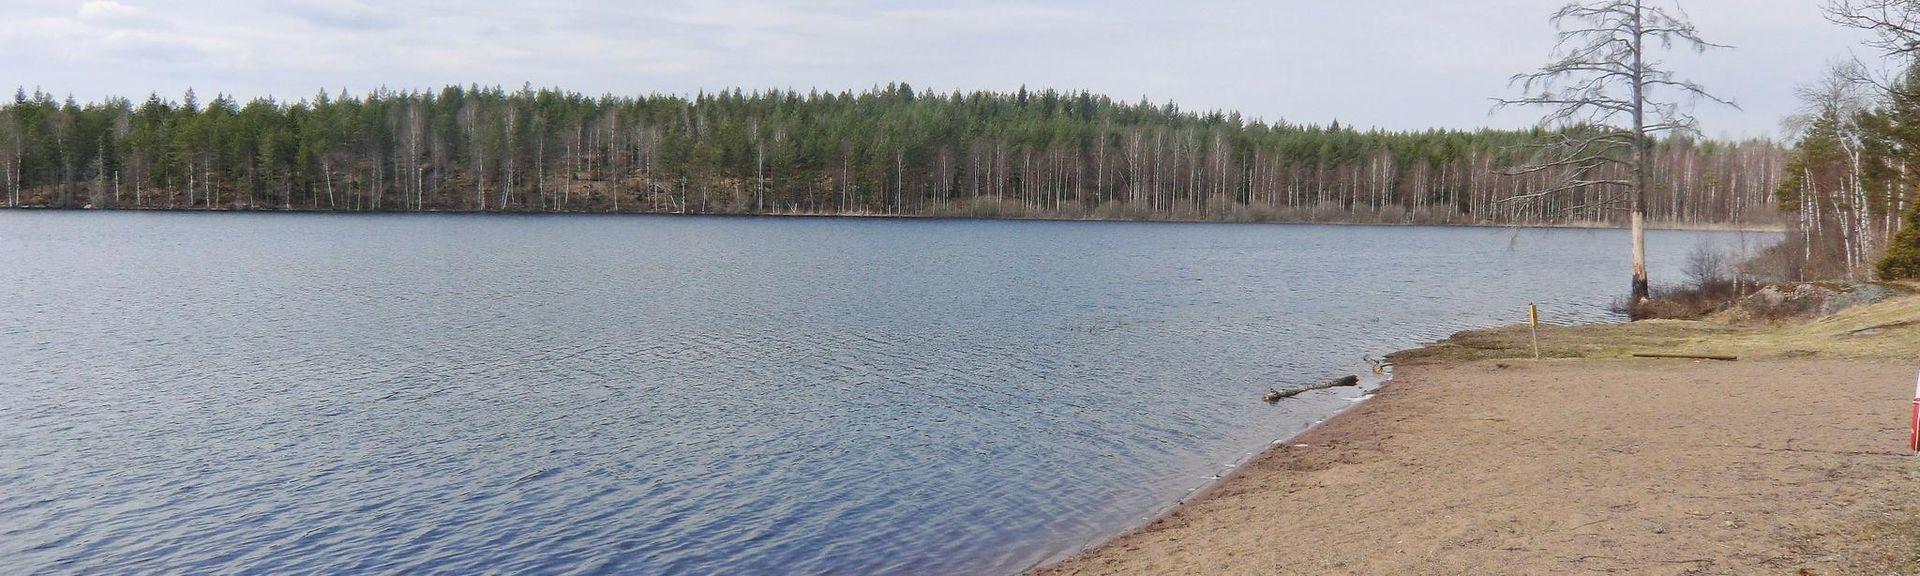 Comté de Jönköping, Suède